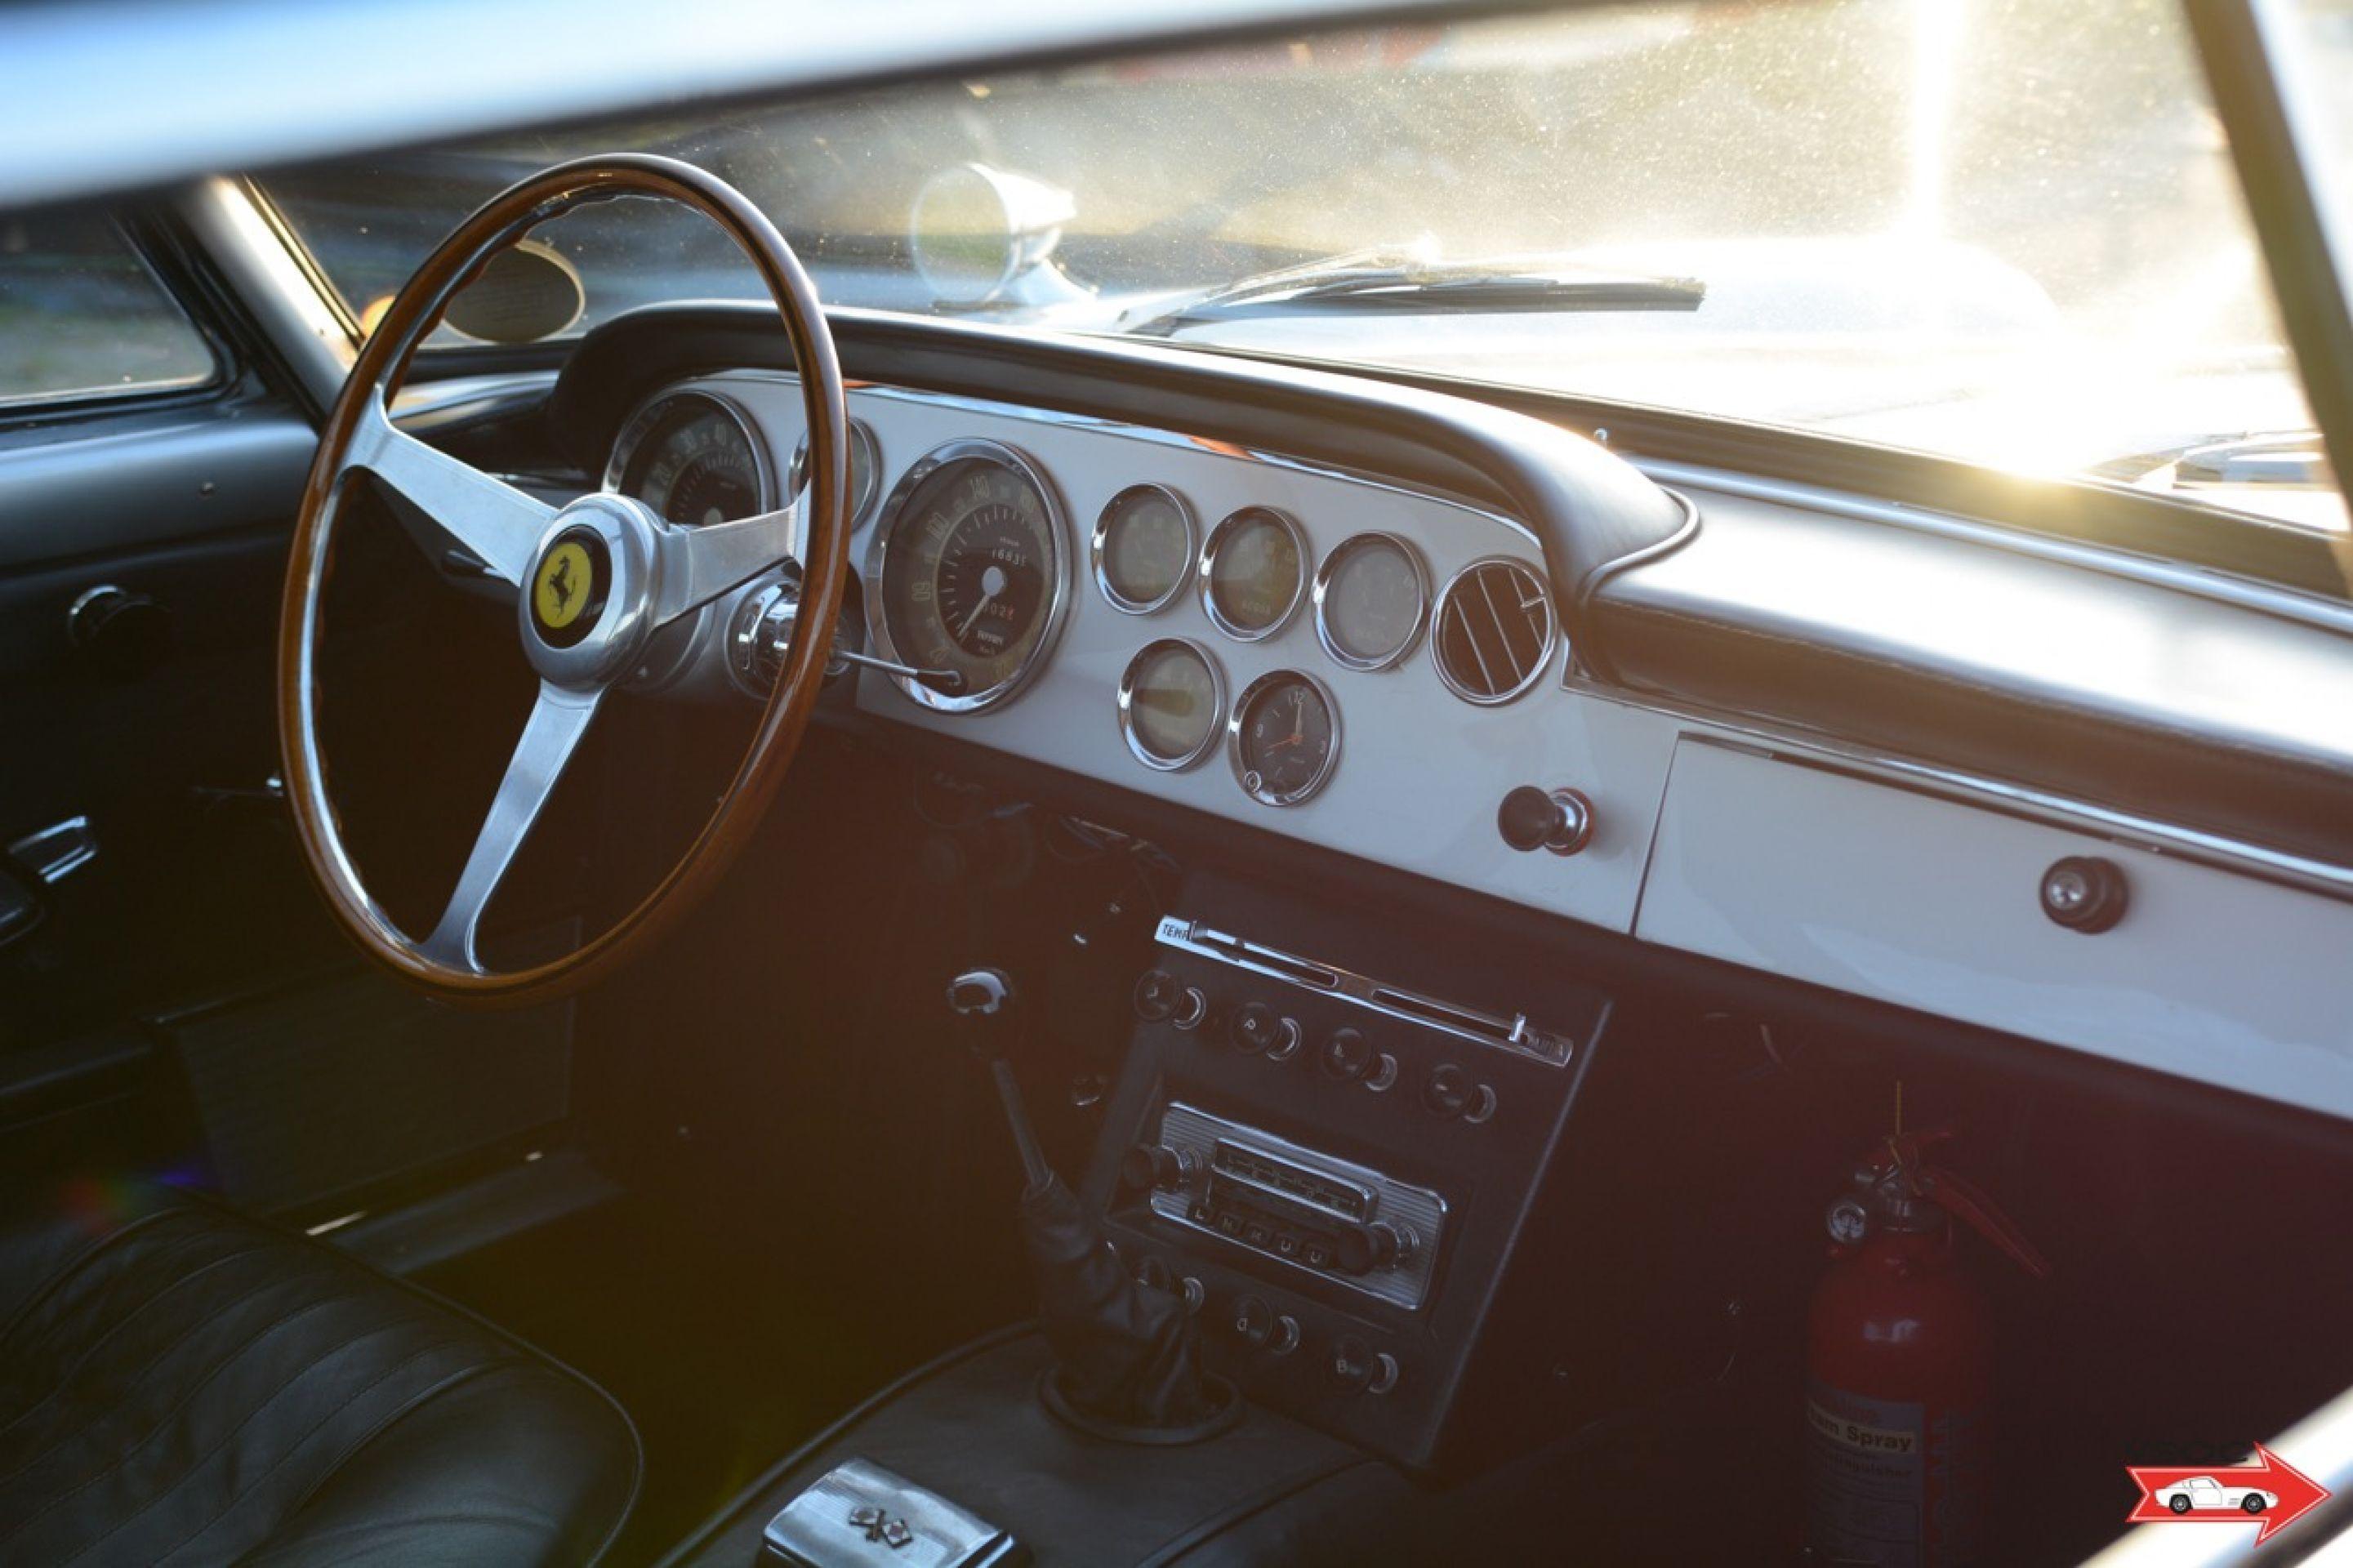 Ferrari 250 GTE - very nice, matching numbers